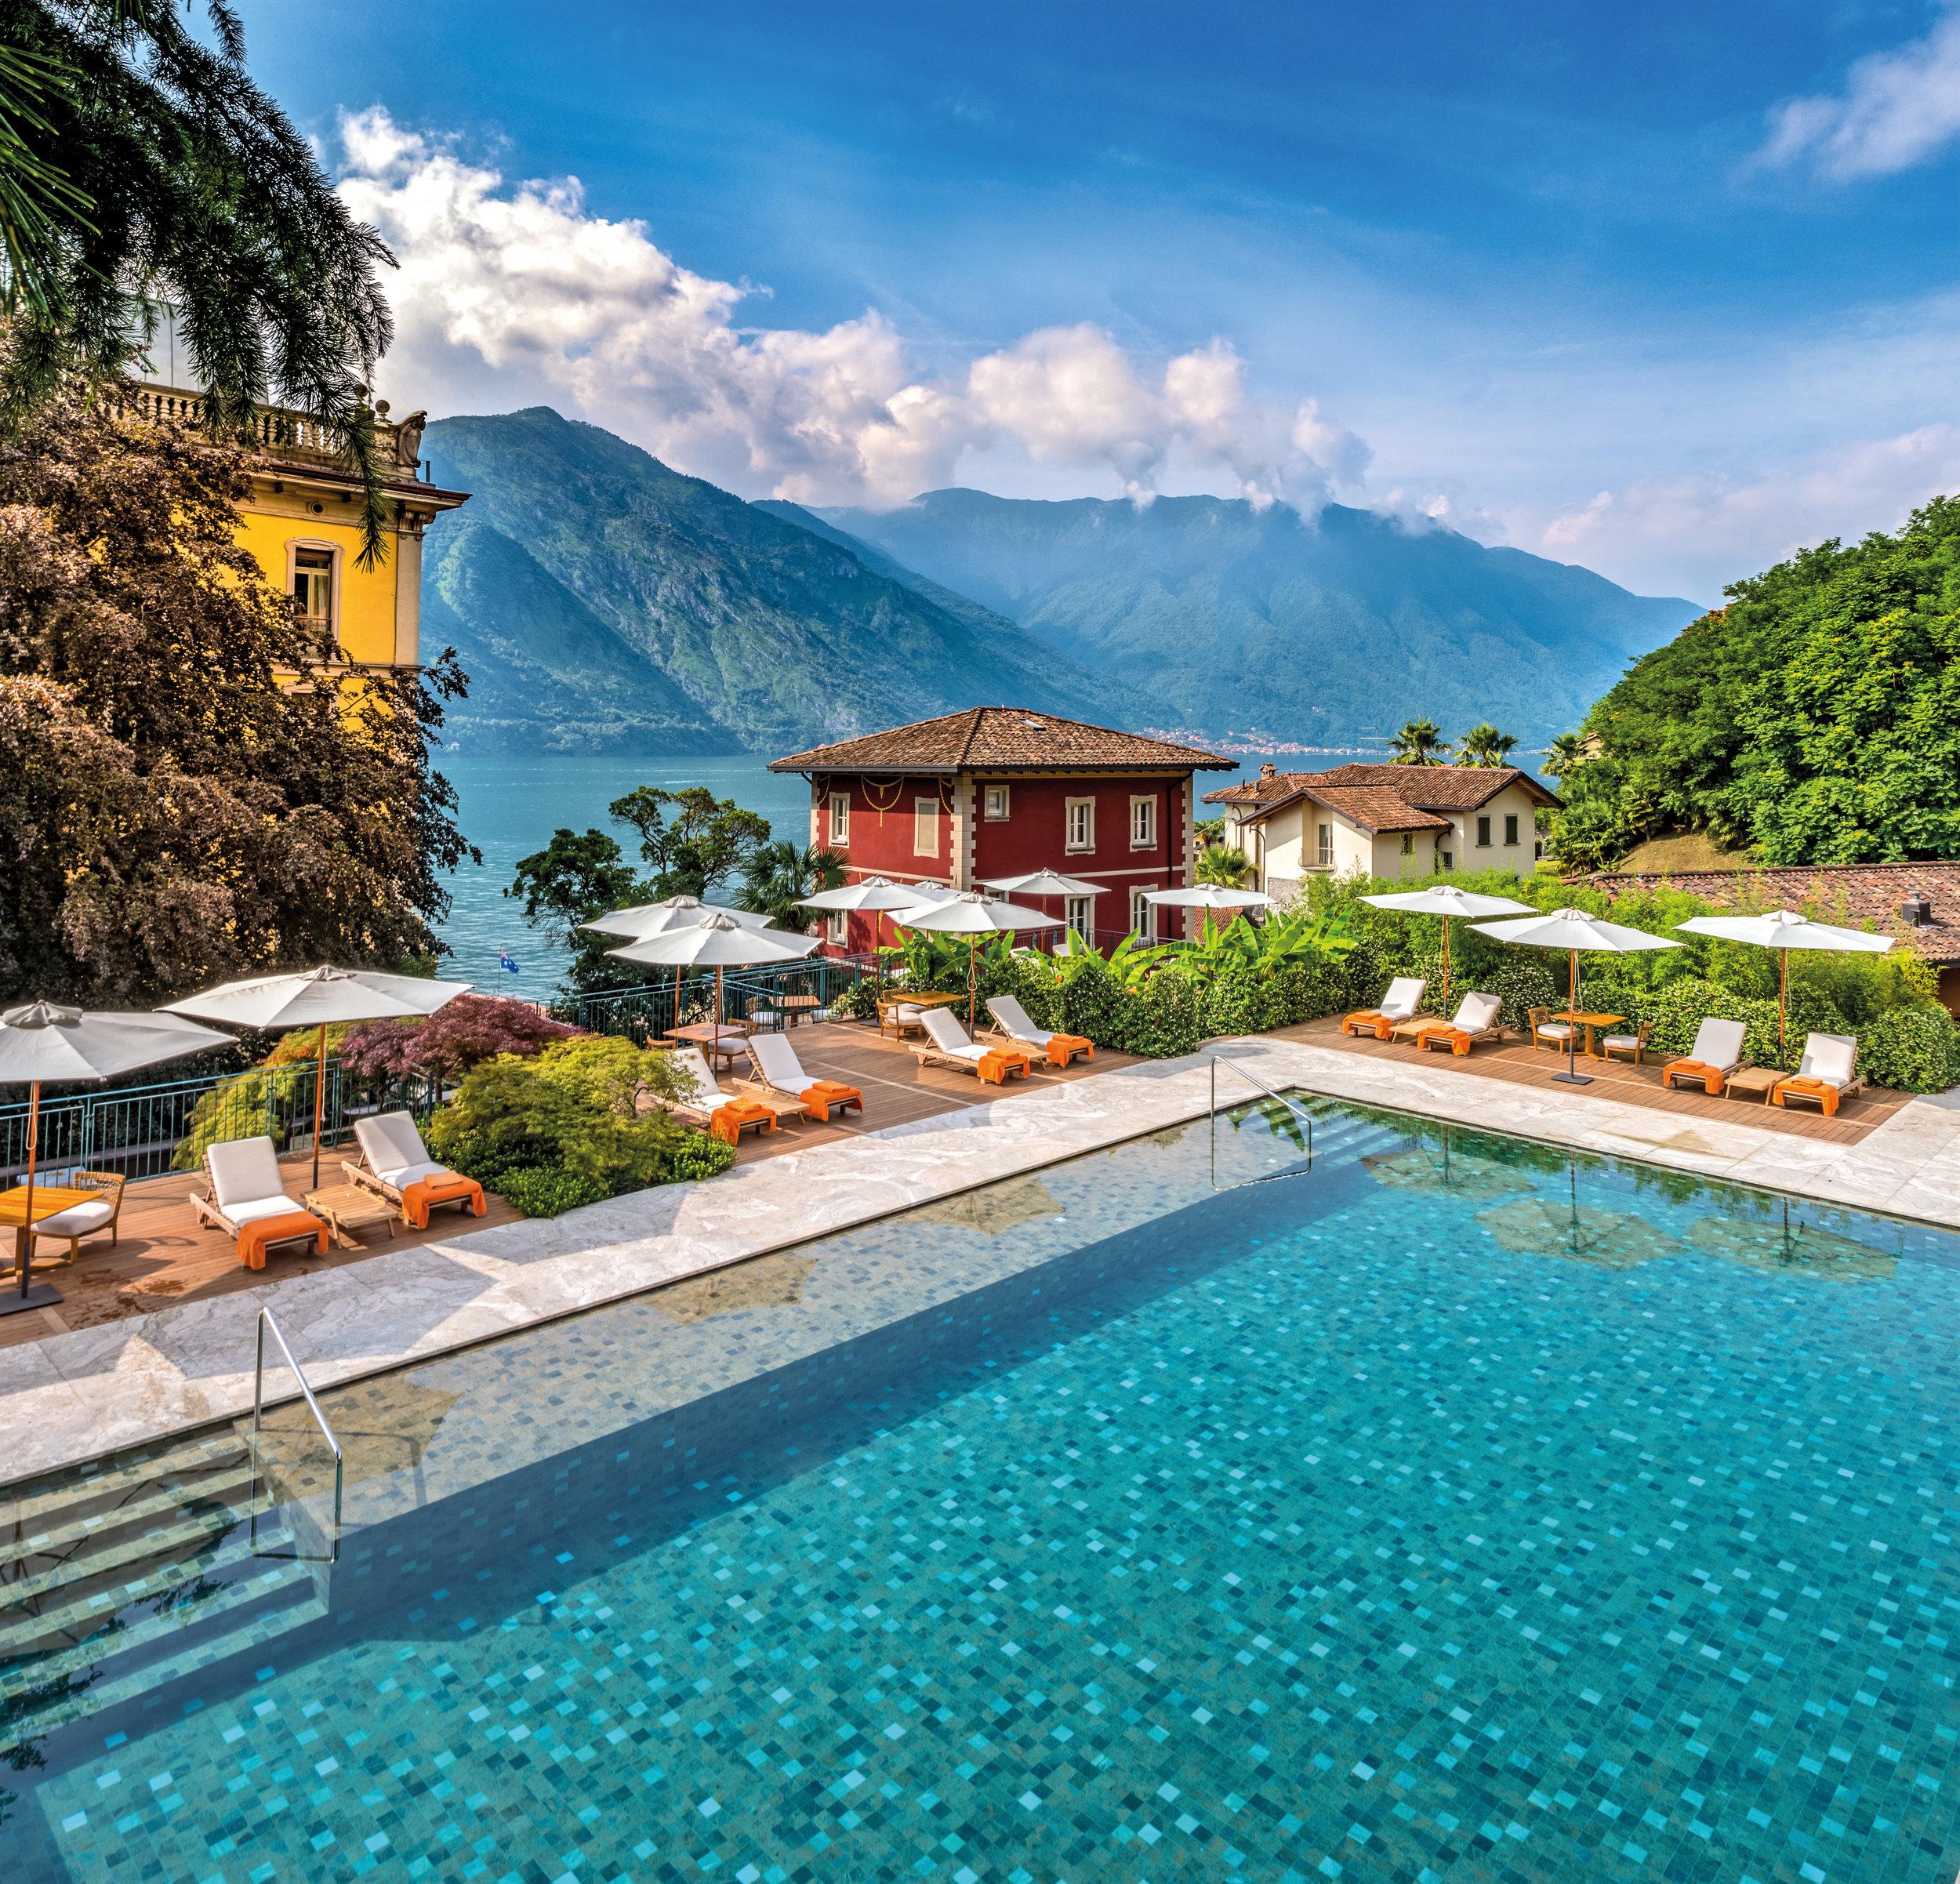 Grand Hotel Tremezzo Pool.jpg